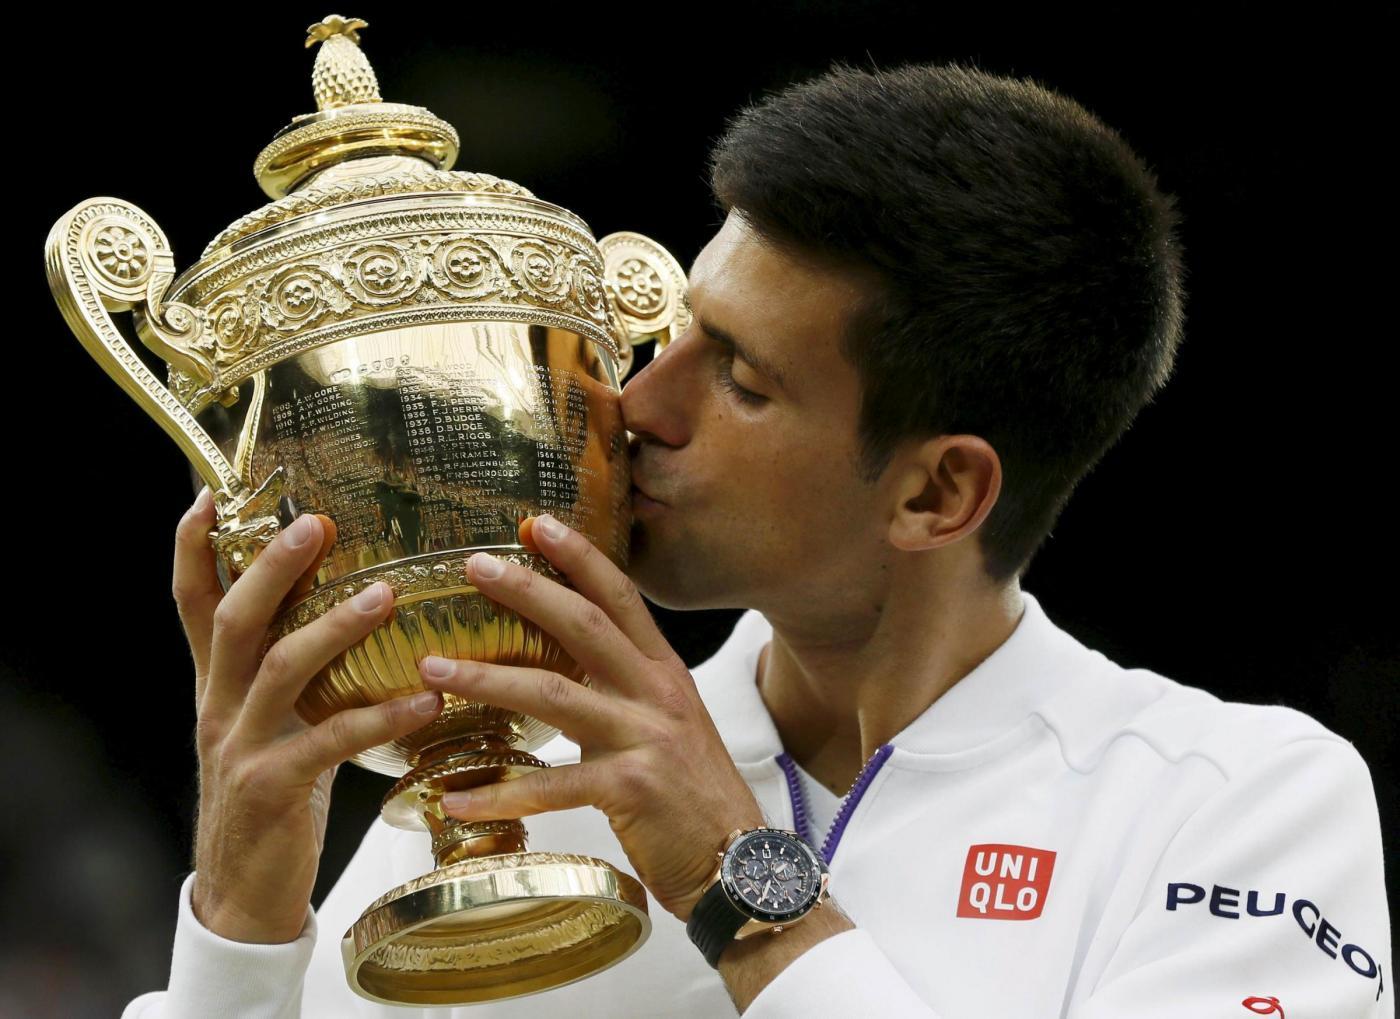 Nole Wimbledon